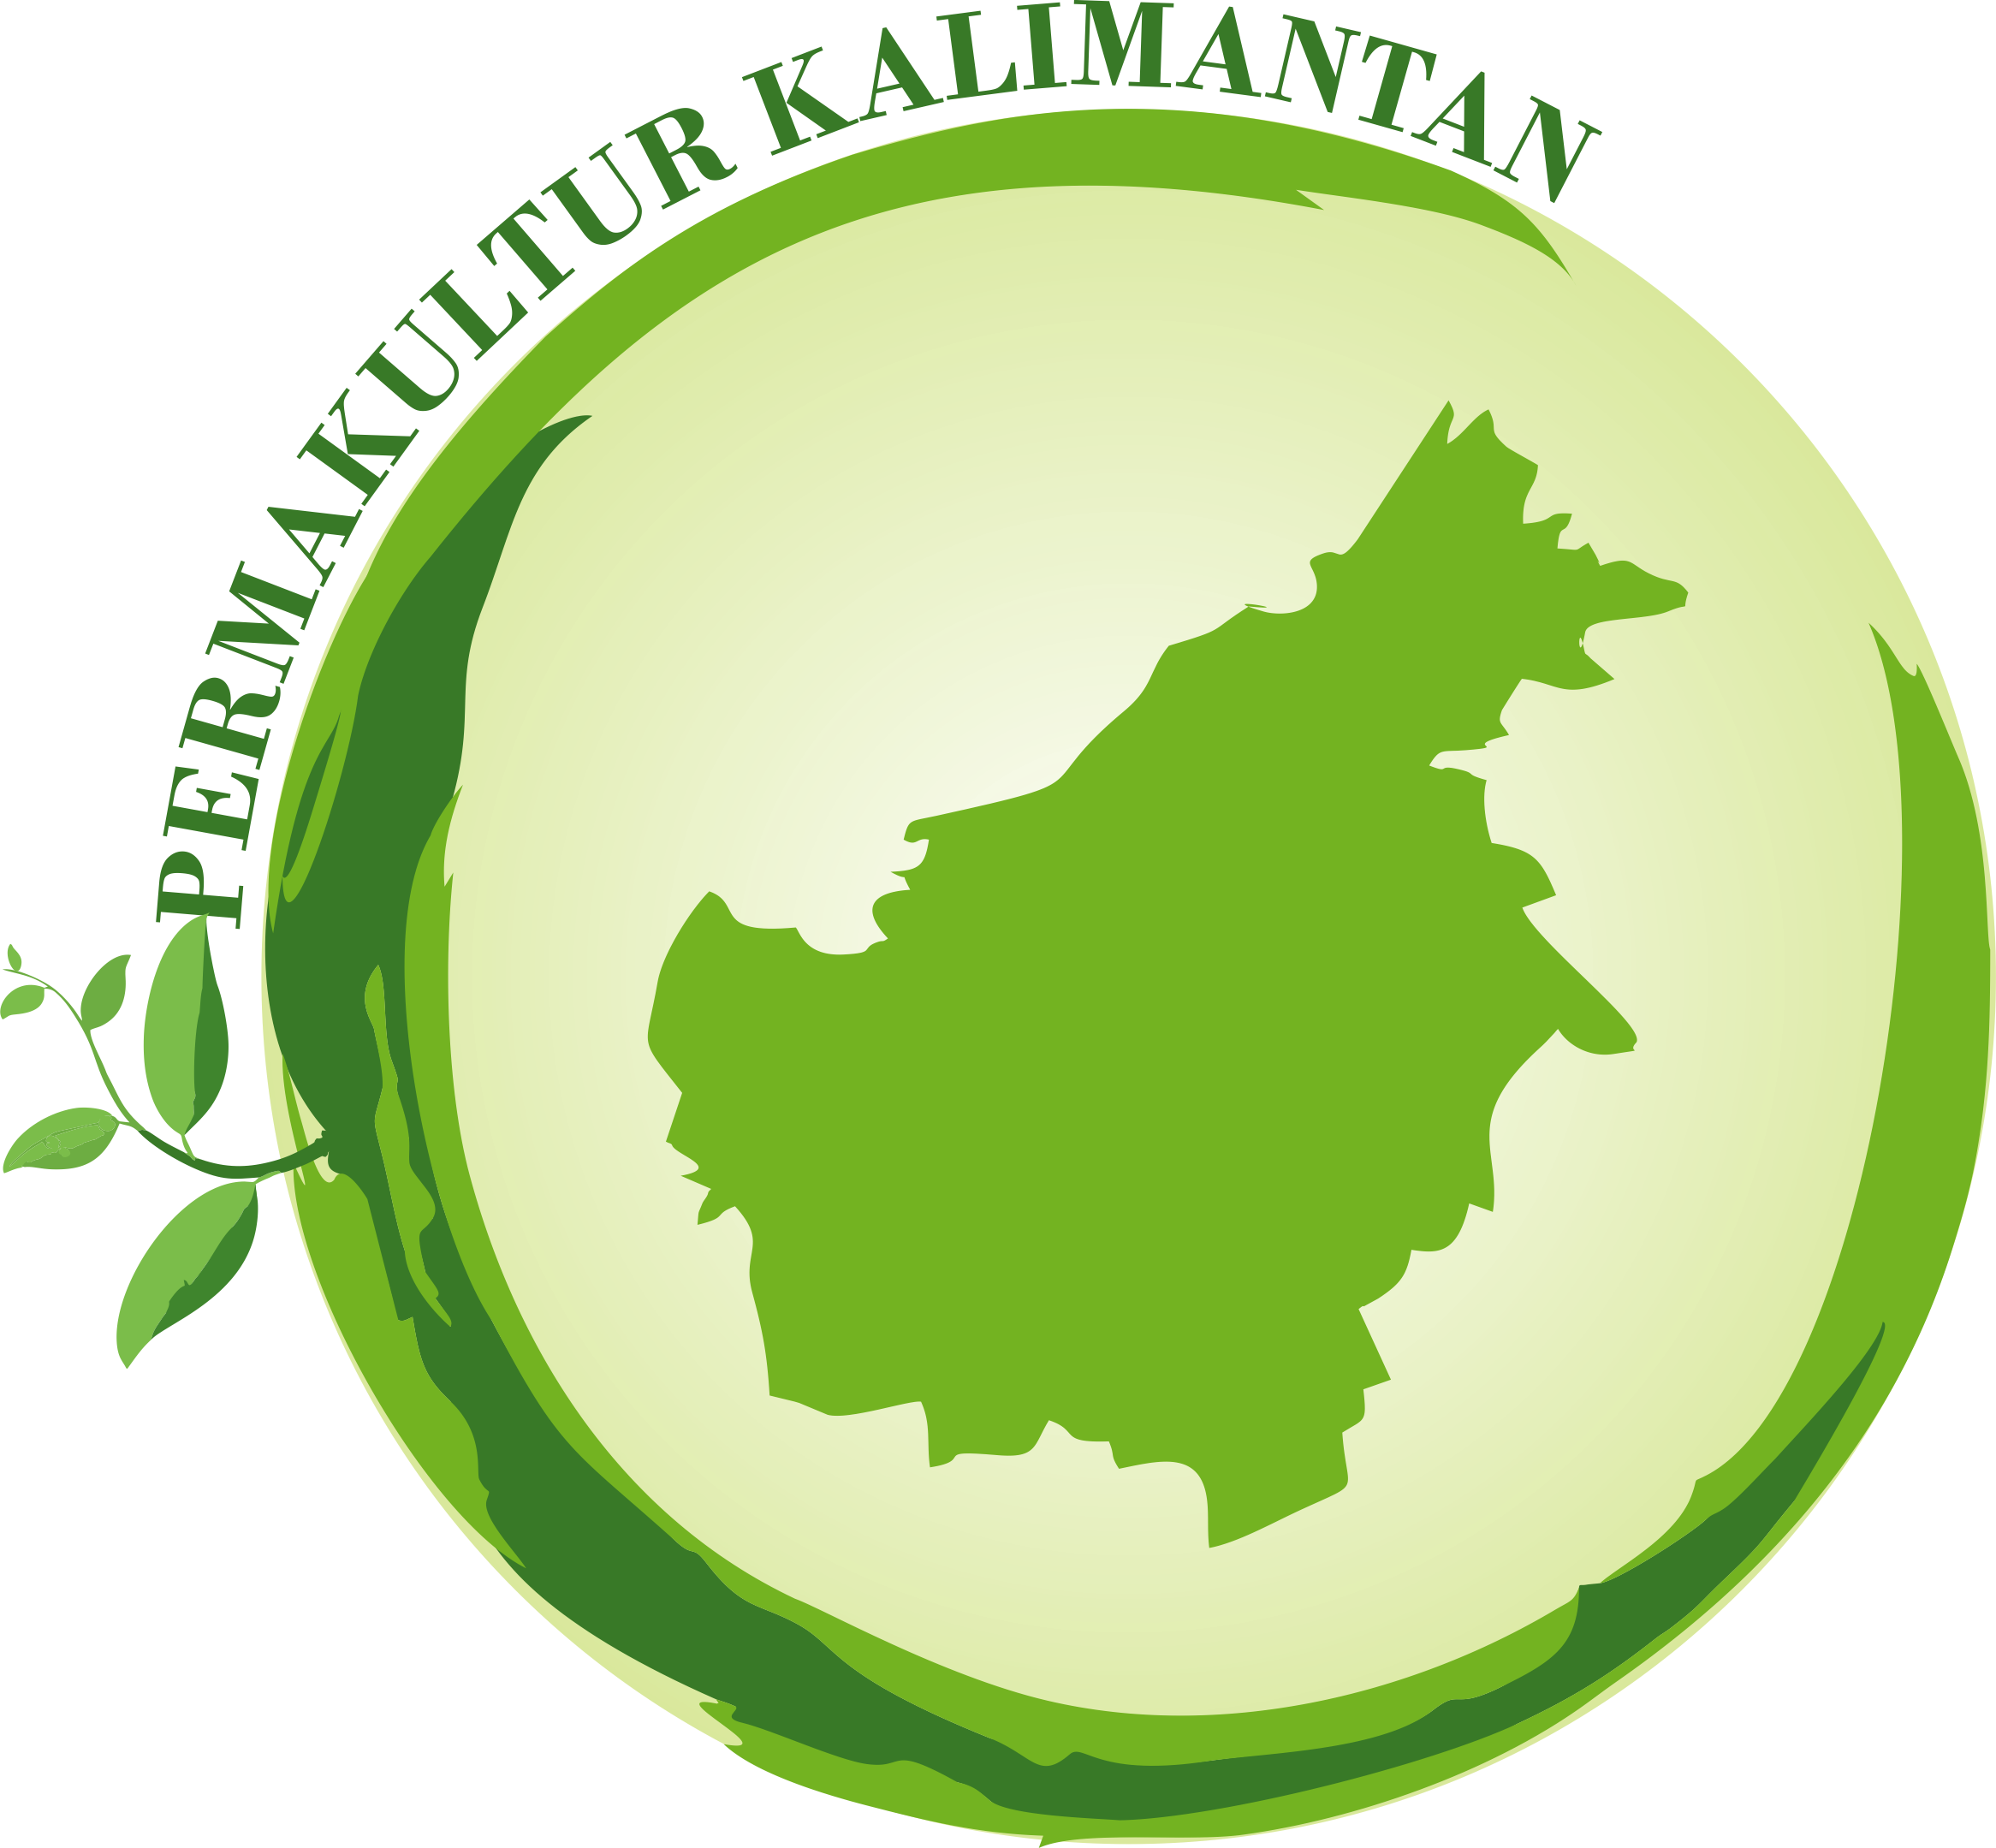 permakultur kalimantan borneo nature foundation borneo nature foundation